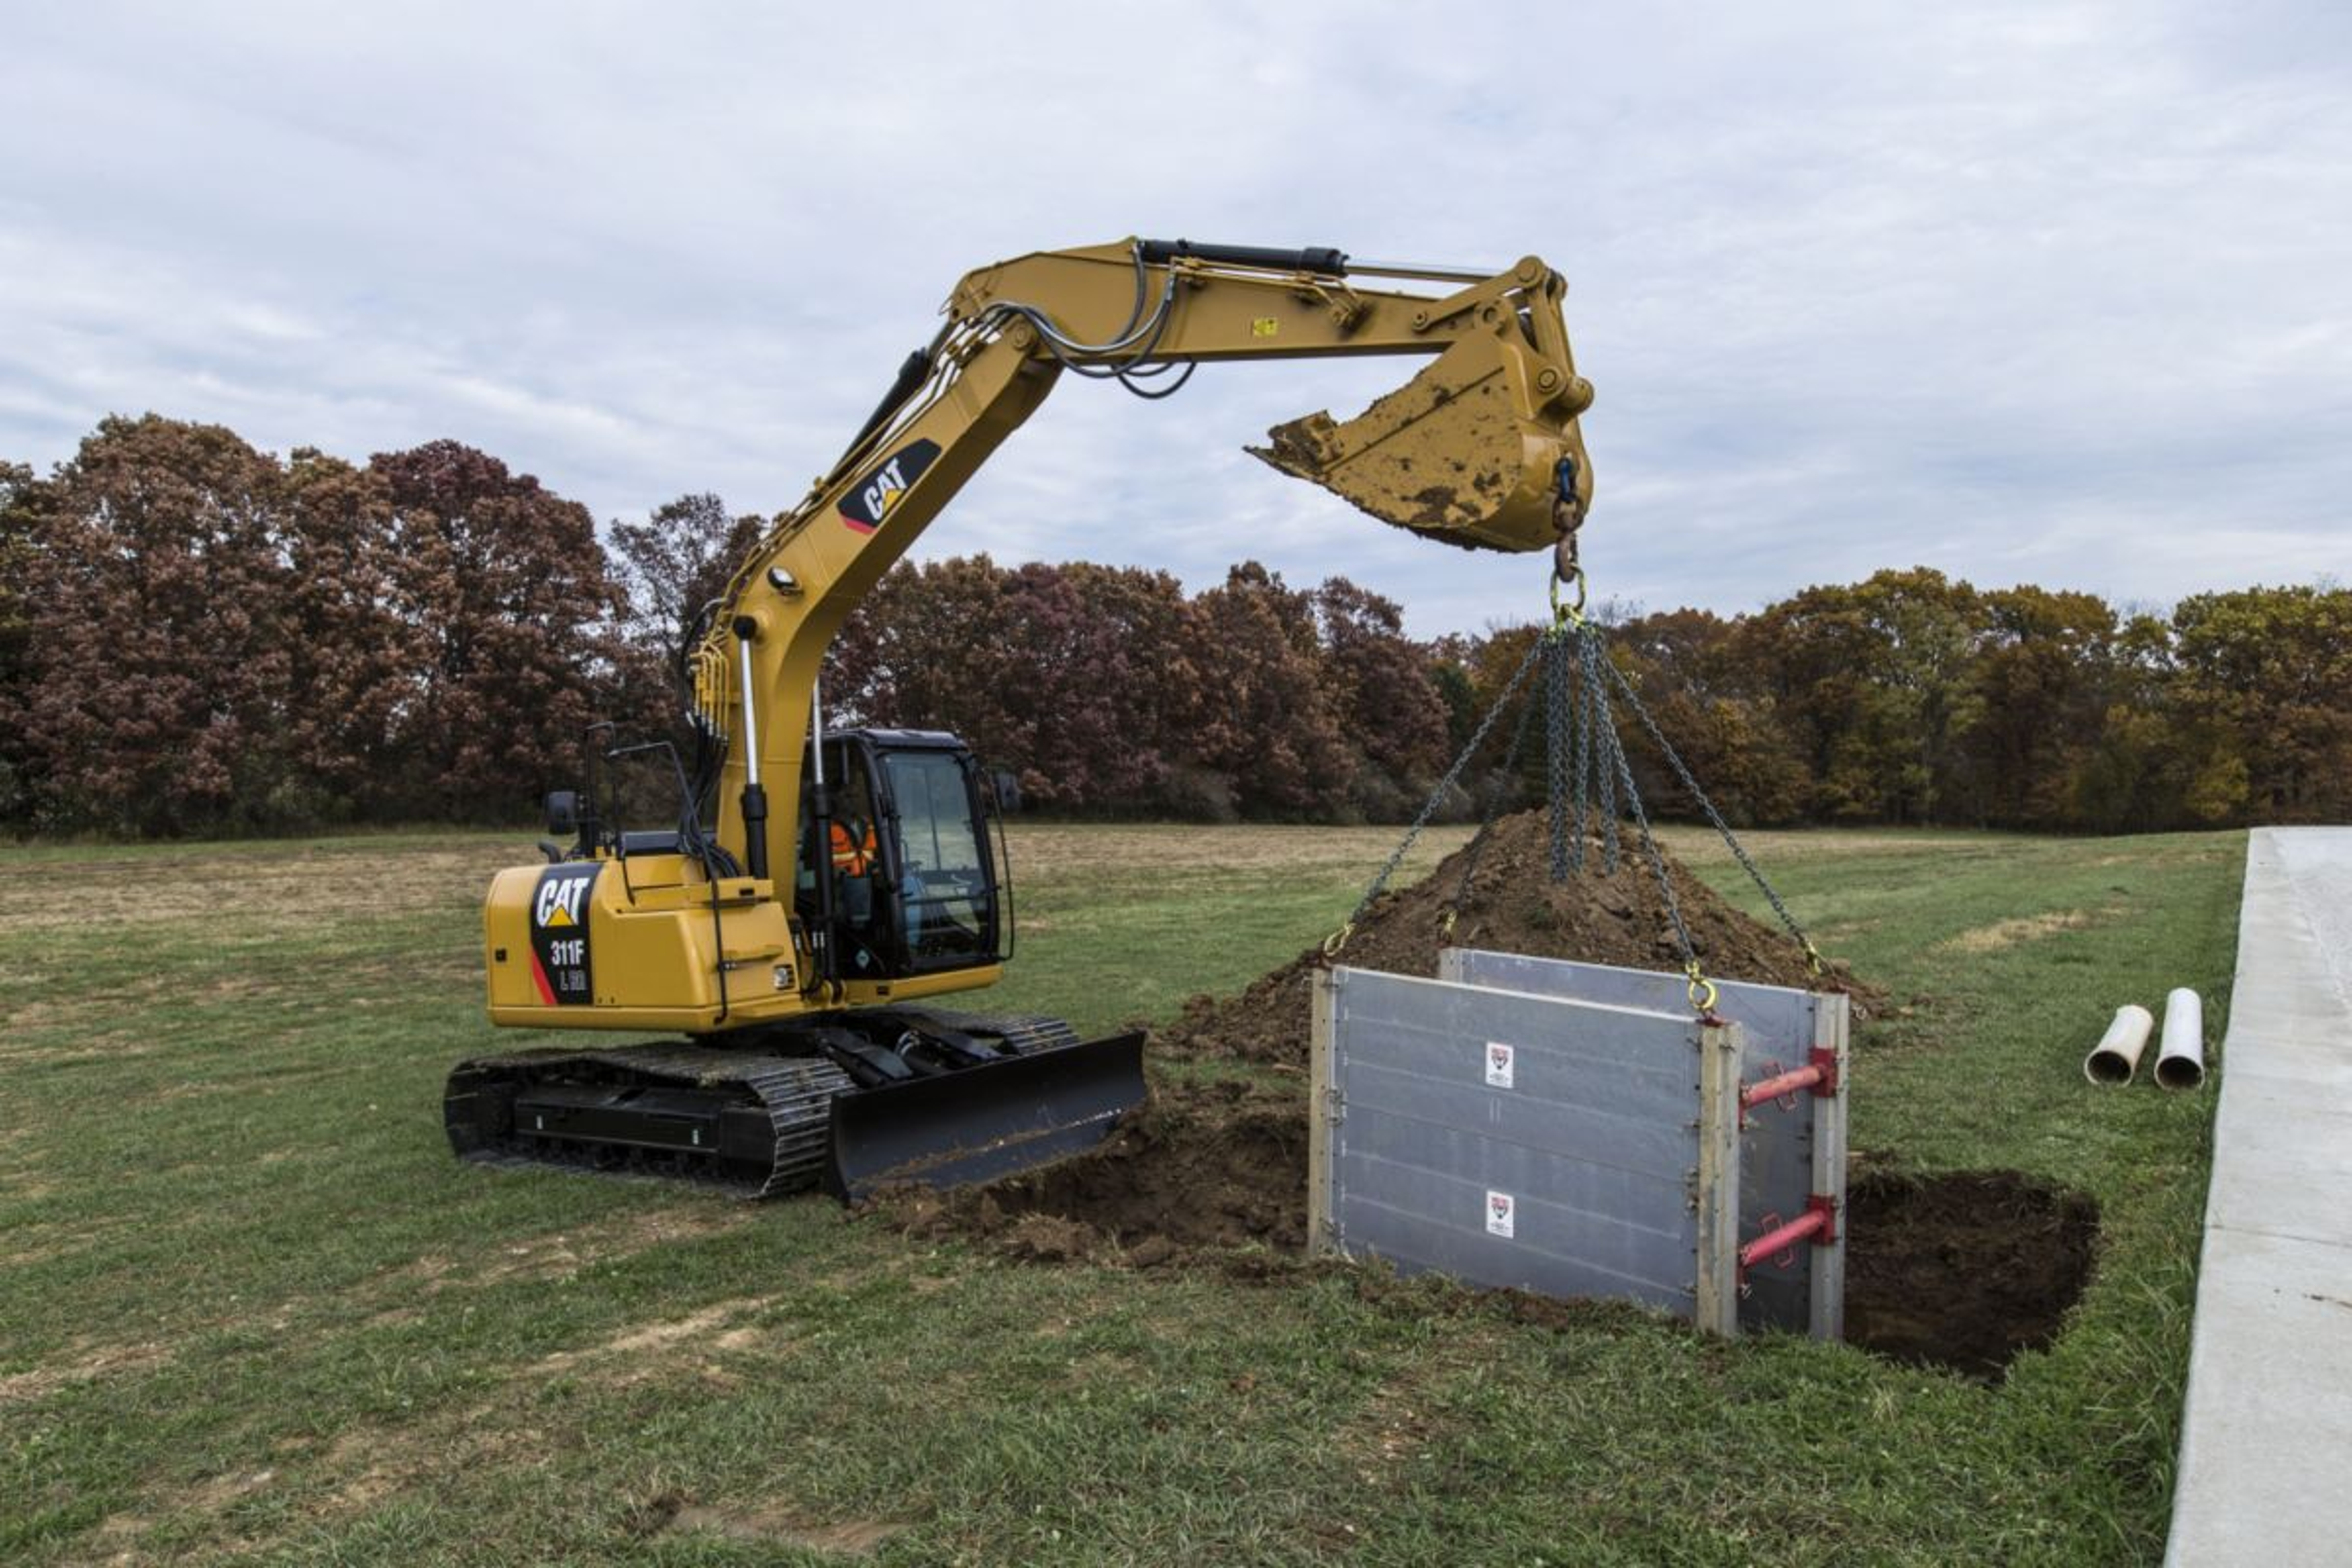 cat new cat 311f lrr excavator saves fuel delivers performance